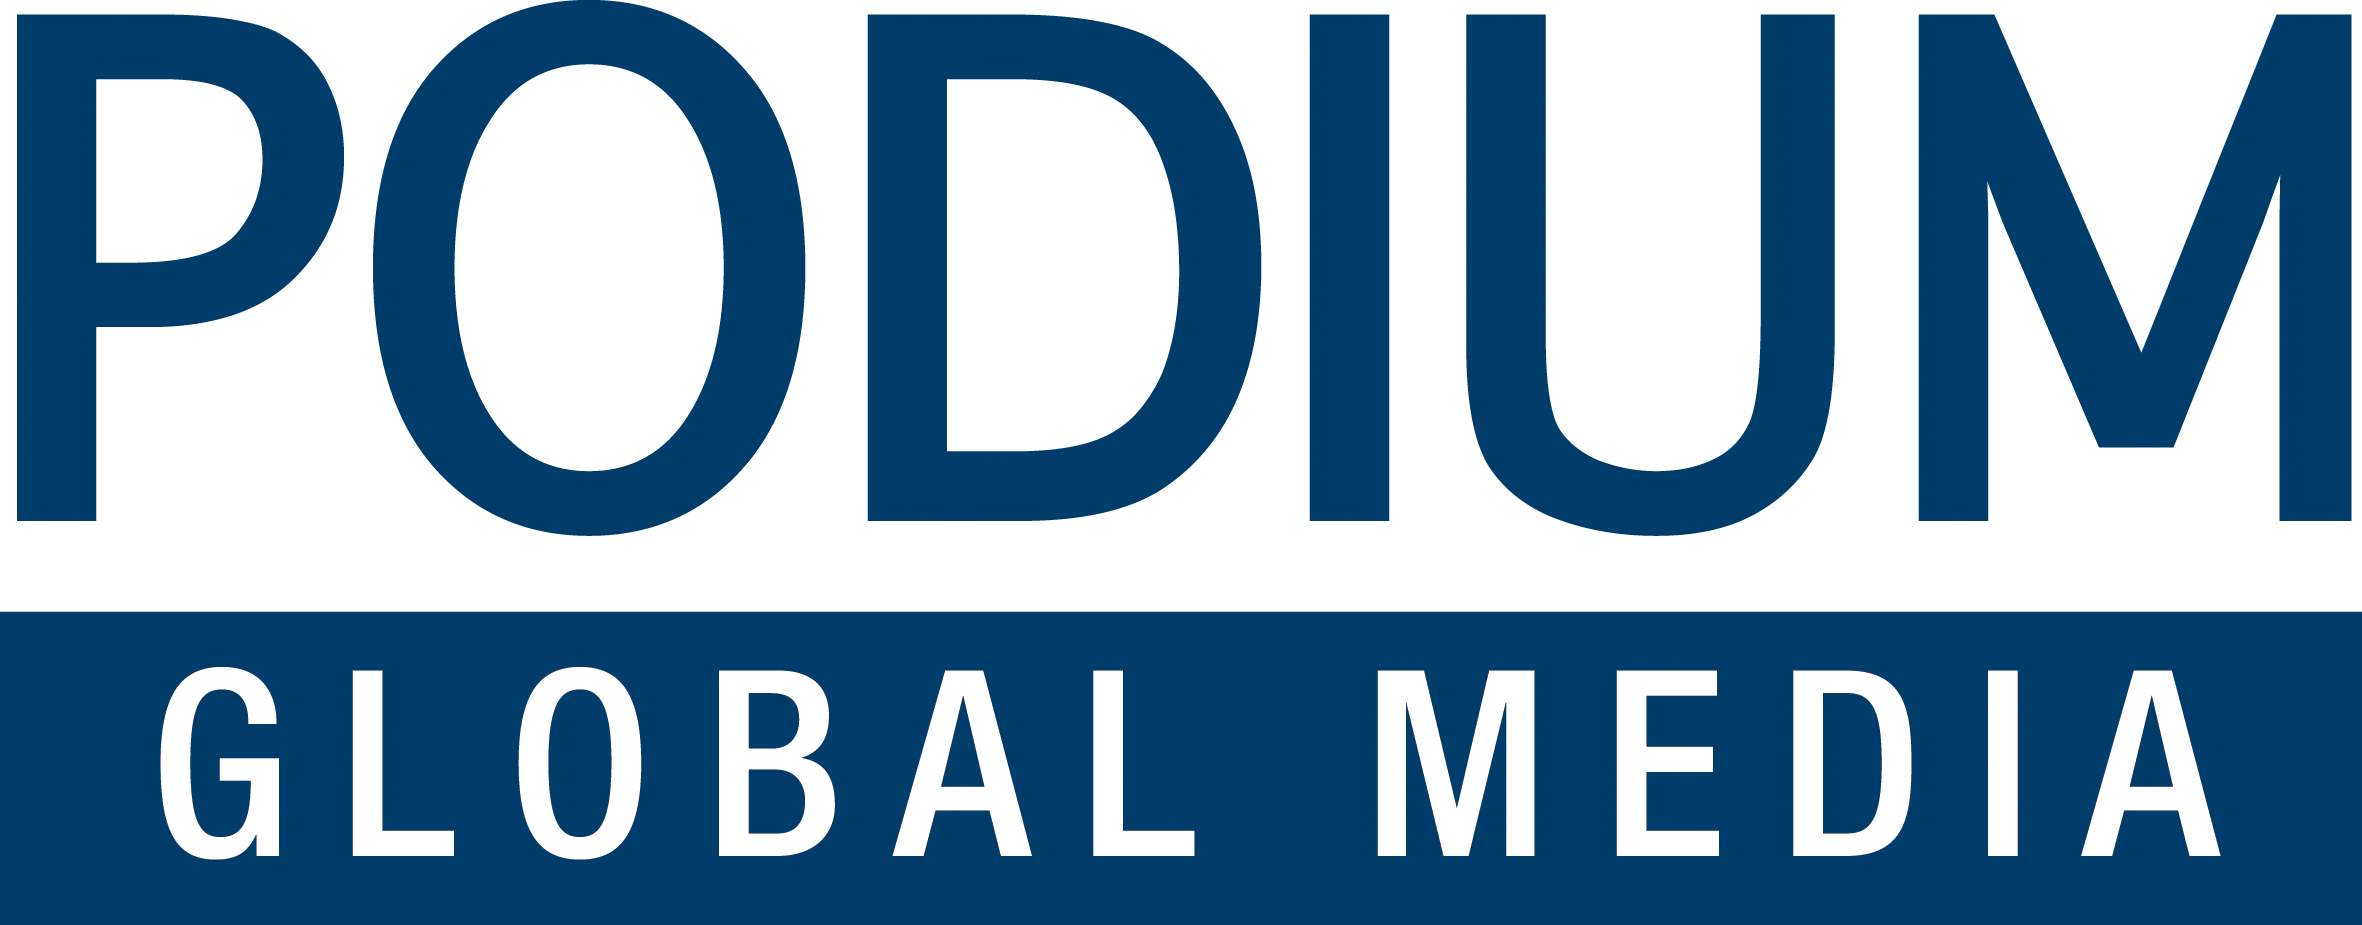 https://campaign-image.eu/zohocampaigns/16486000007494047_zc_v24_logo_podium_global_media_2017_traz_(1).png